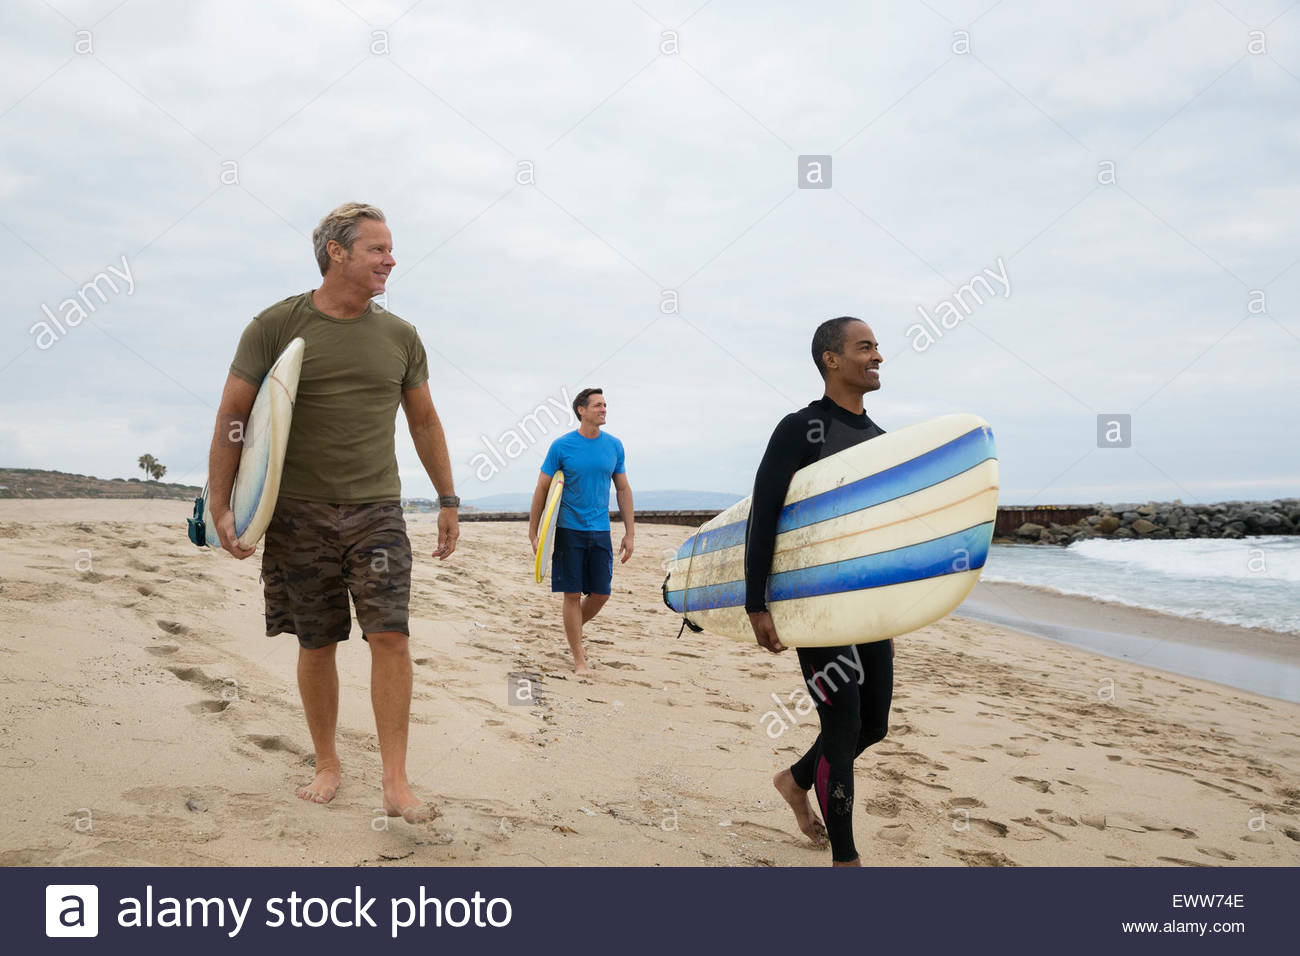 Männer mit Surfbrettern zu Fuß am Strand Stockbild